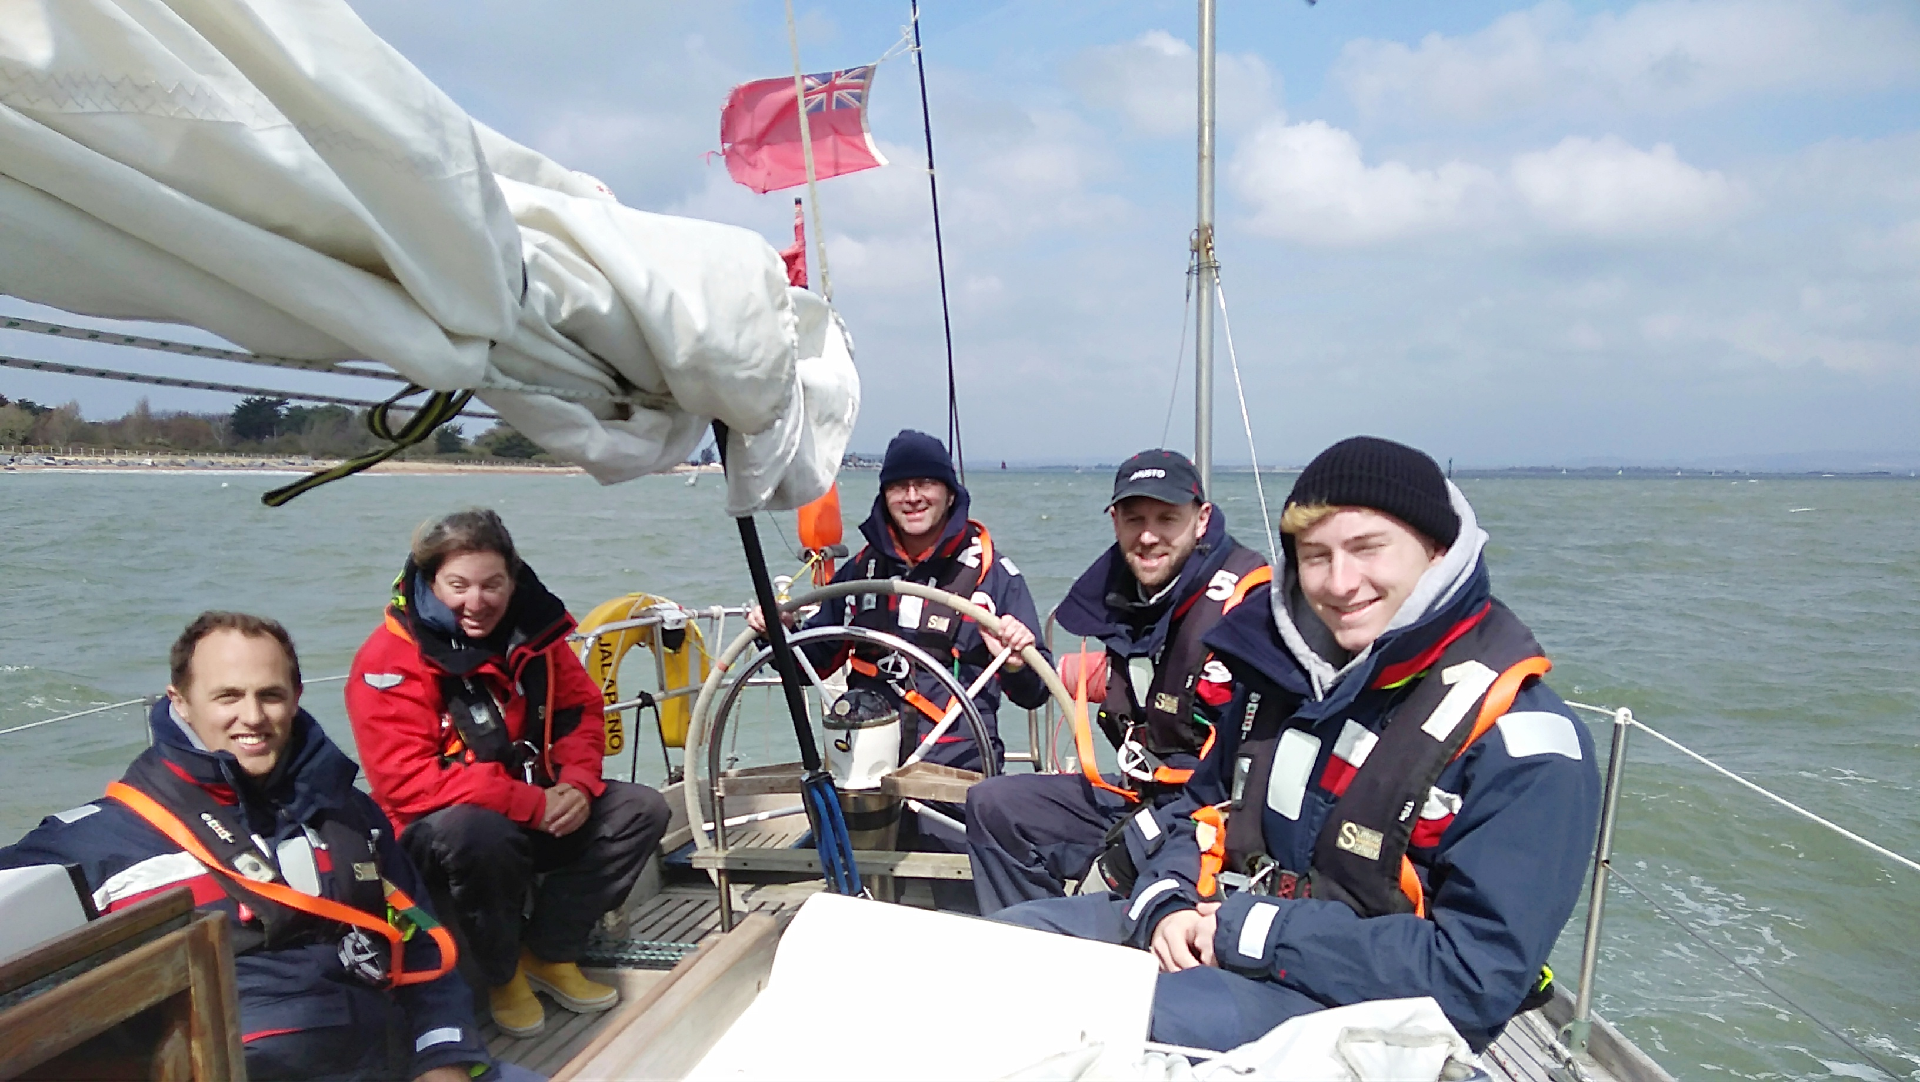 April sailing in the Solent